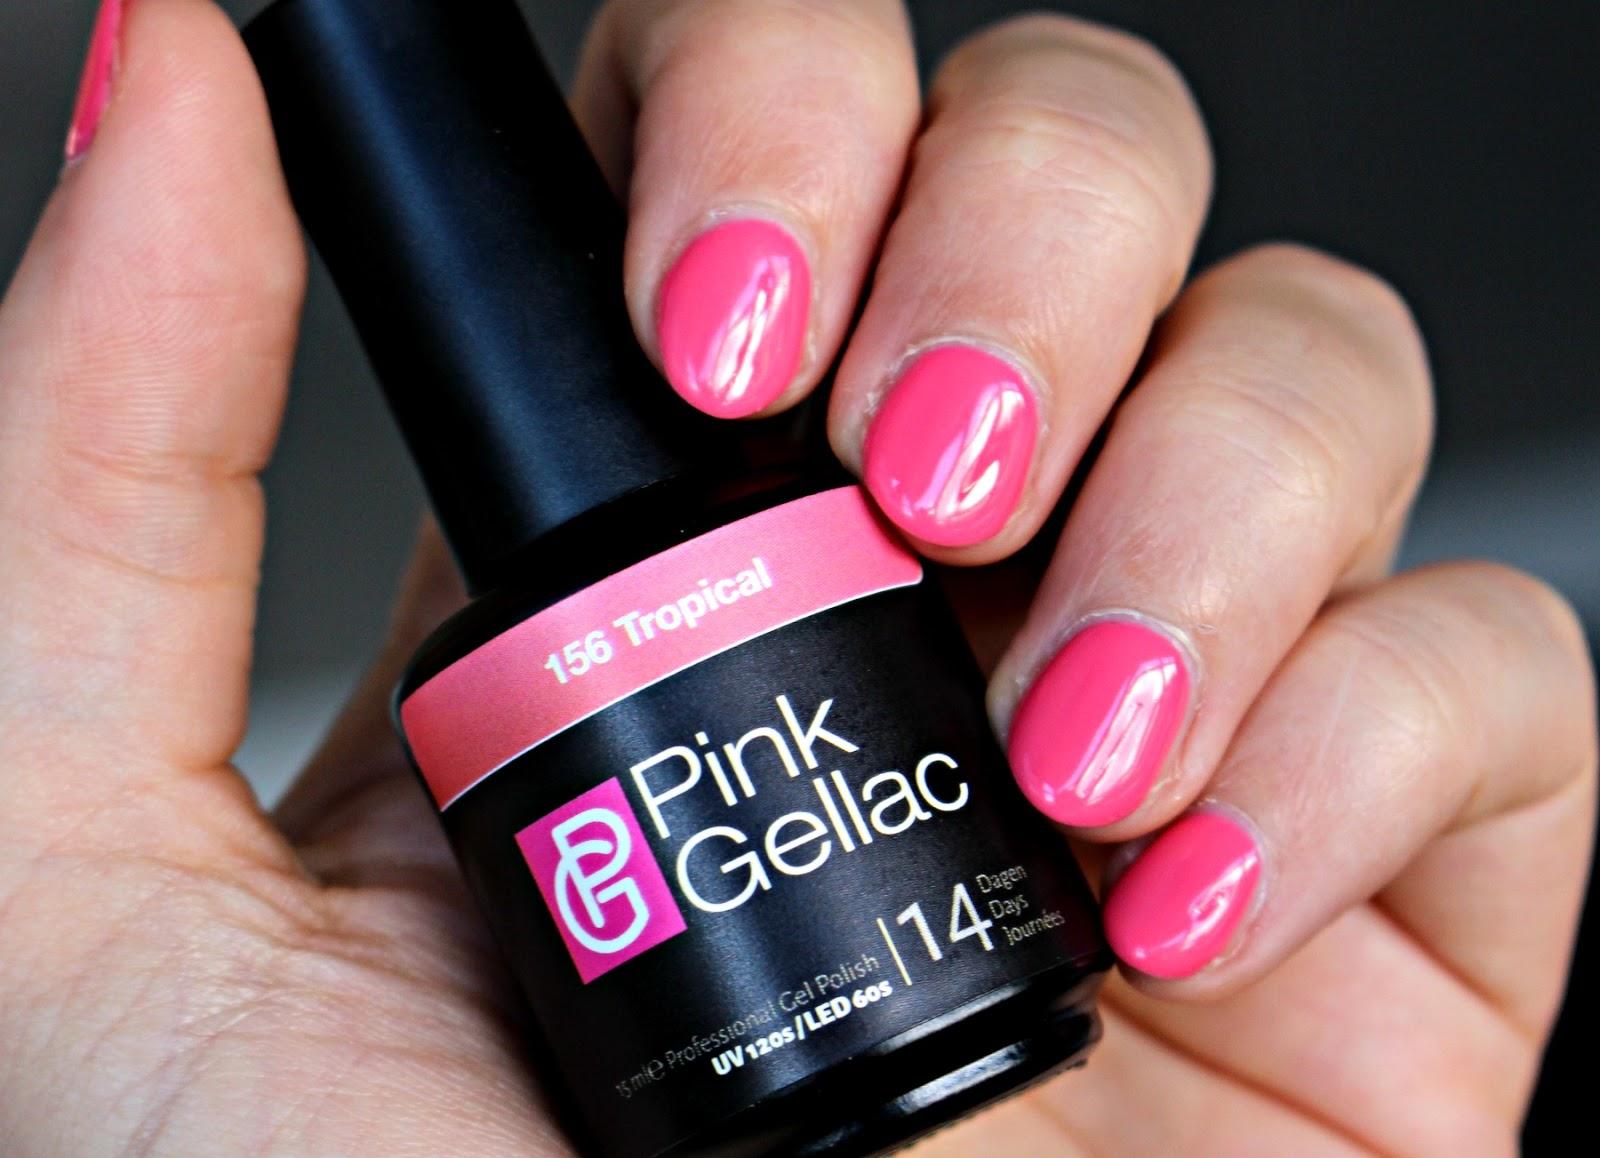 Pink Gellac 156 Tropicalµ